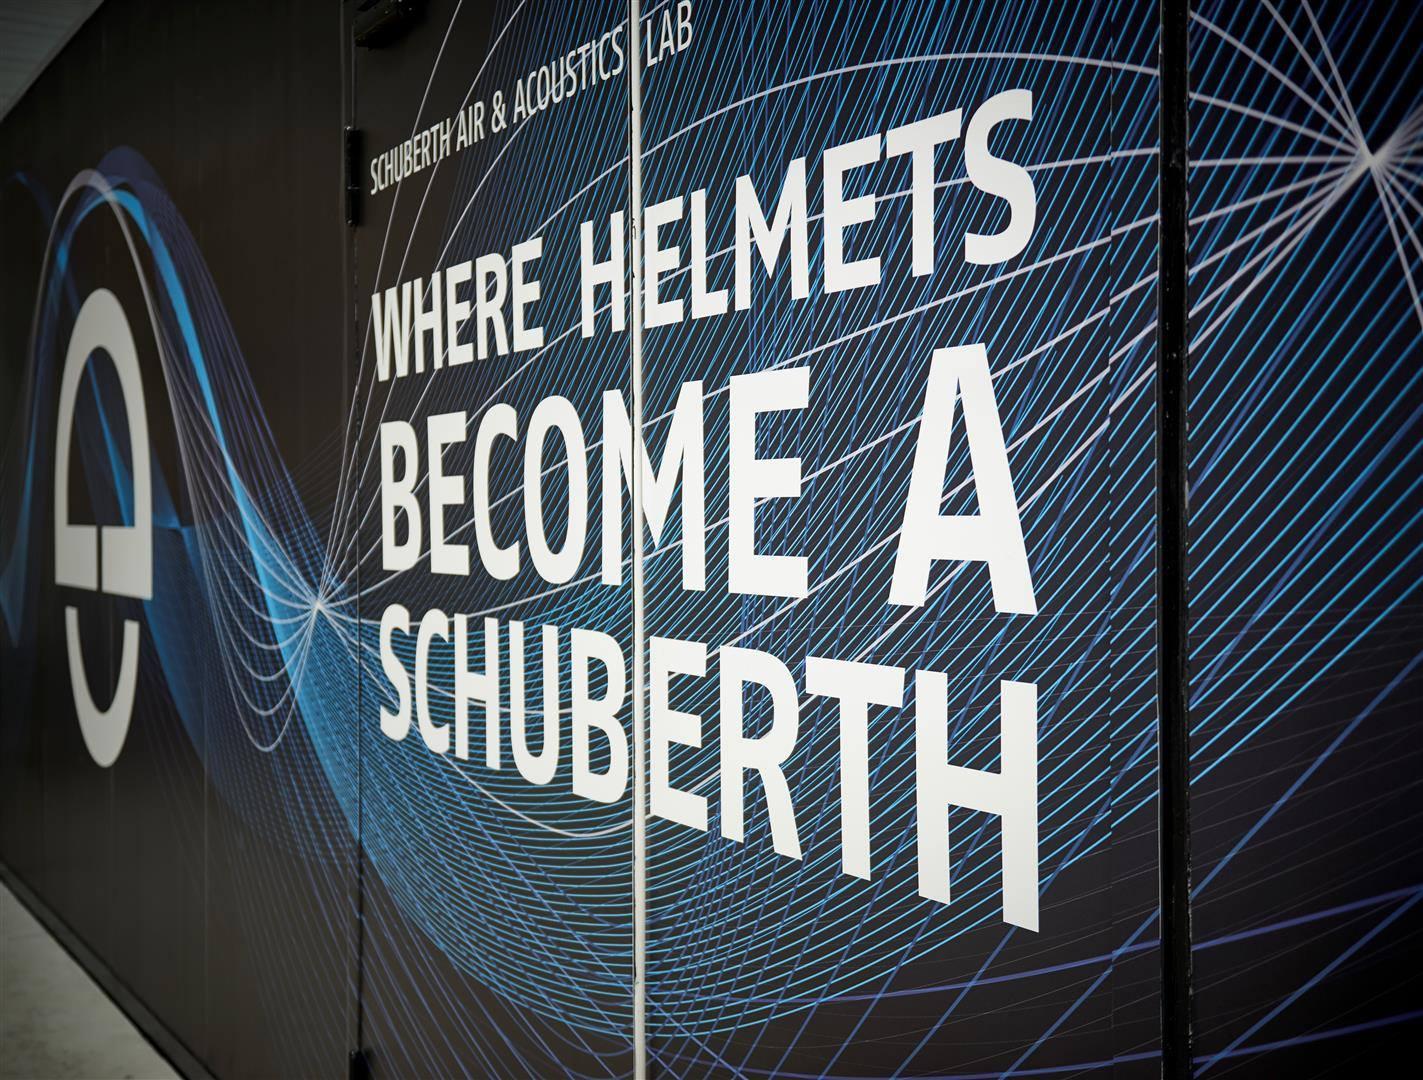 schubeth test lab (6)